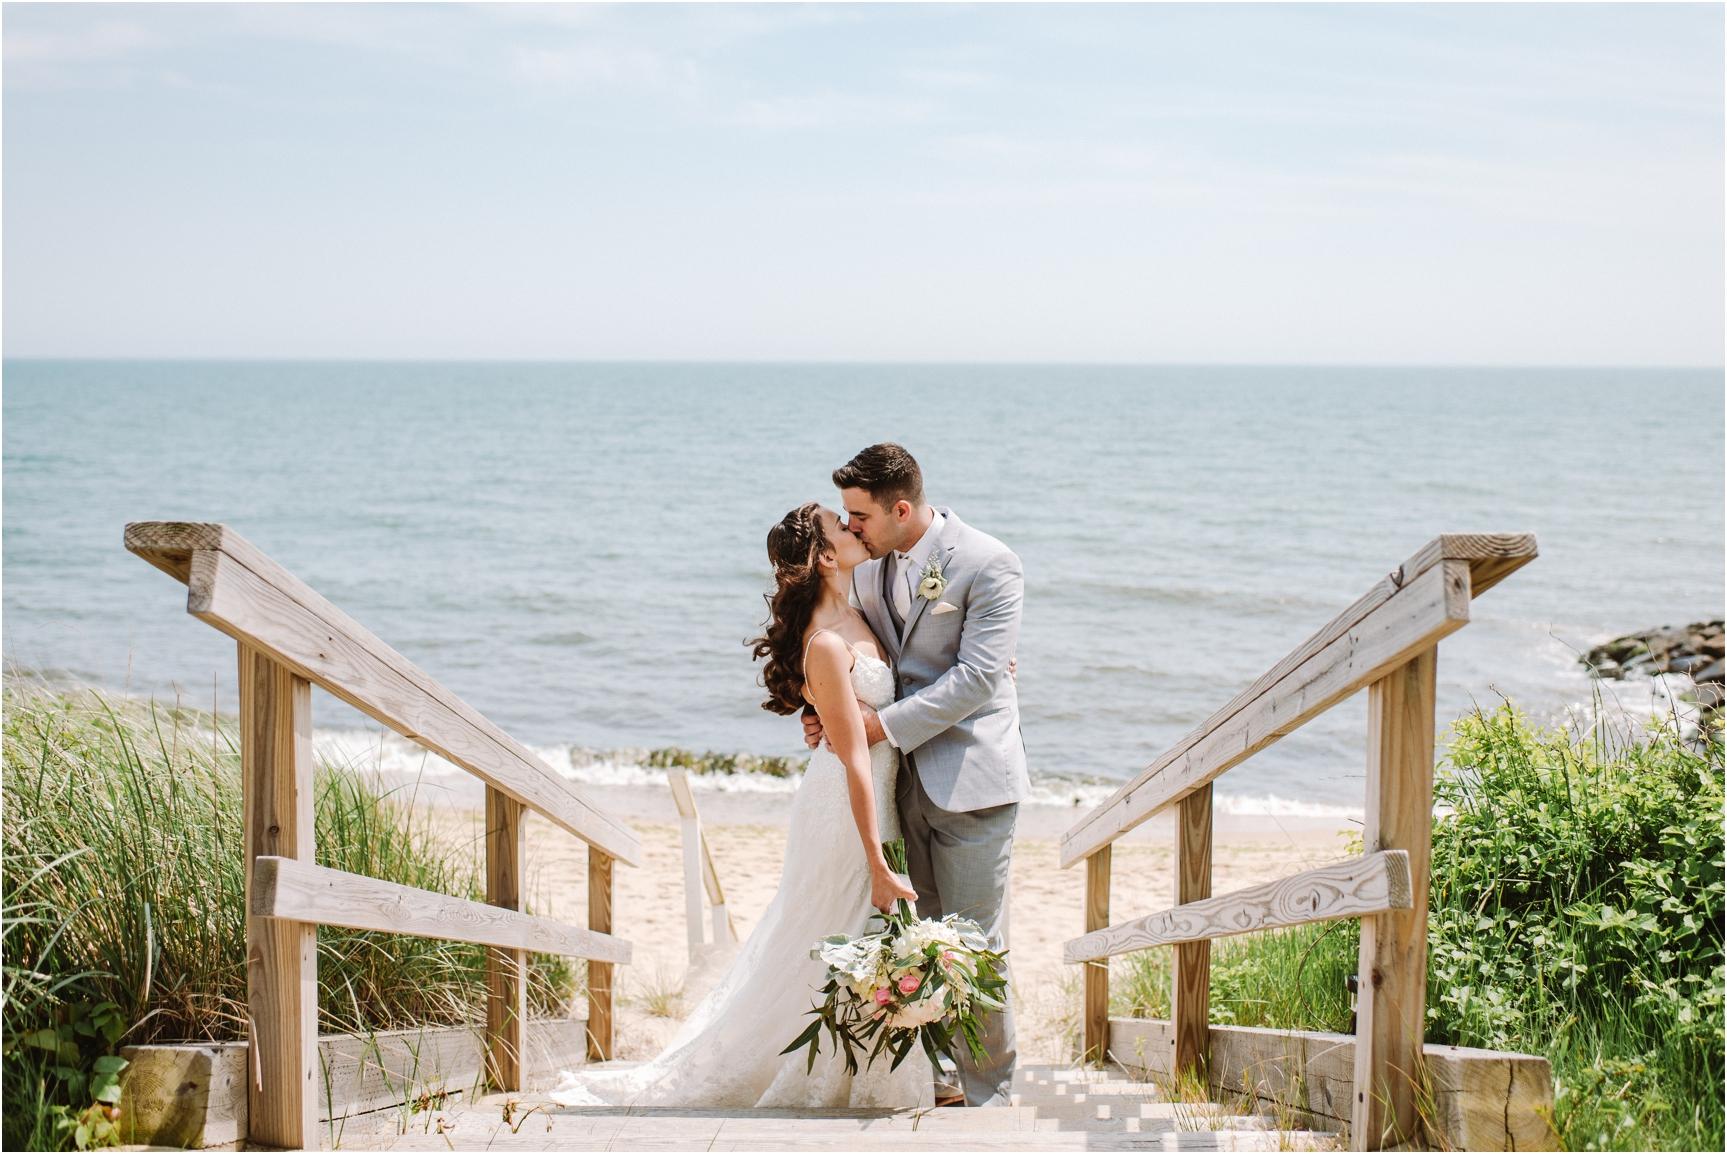 Sarah & Sam Pelham House Cape Cod Wedding Photographer-52.jpg